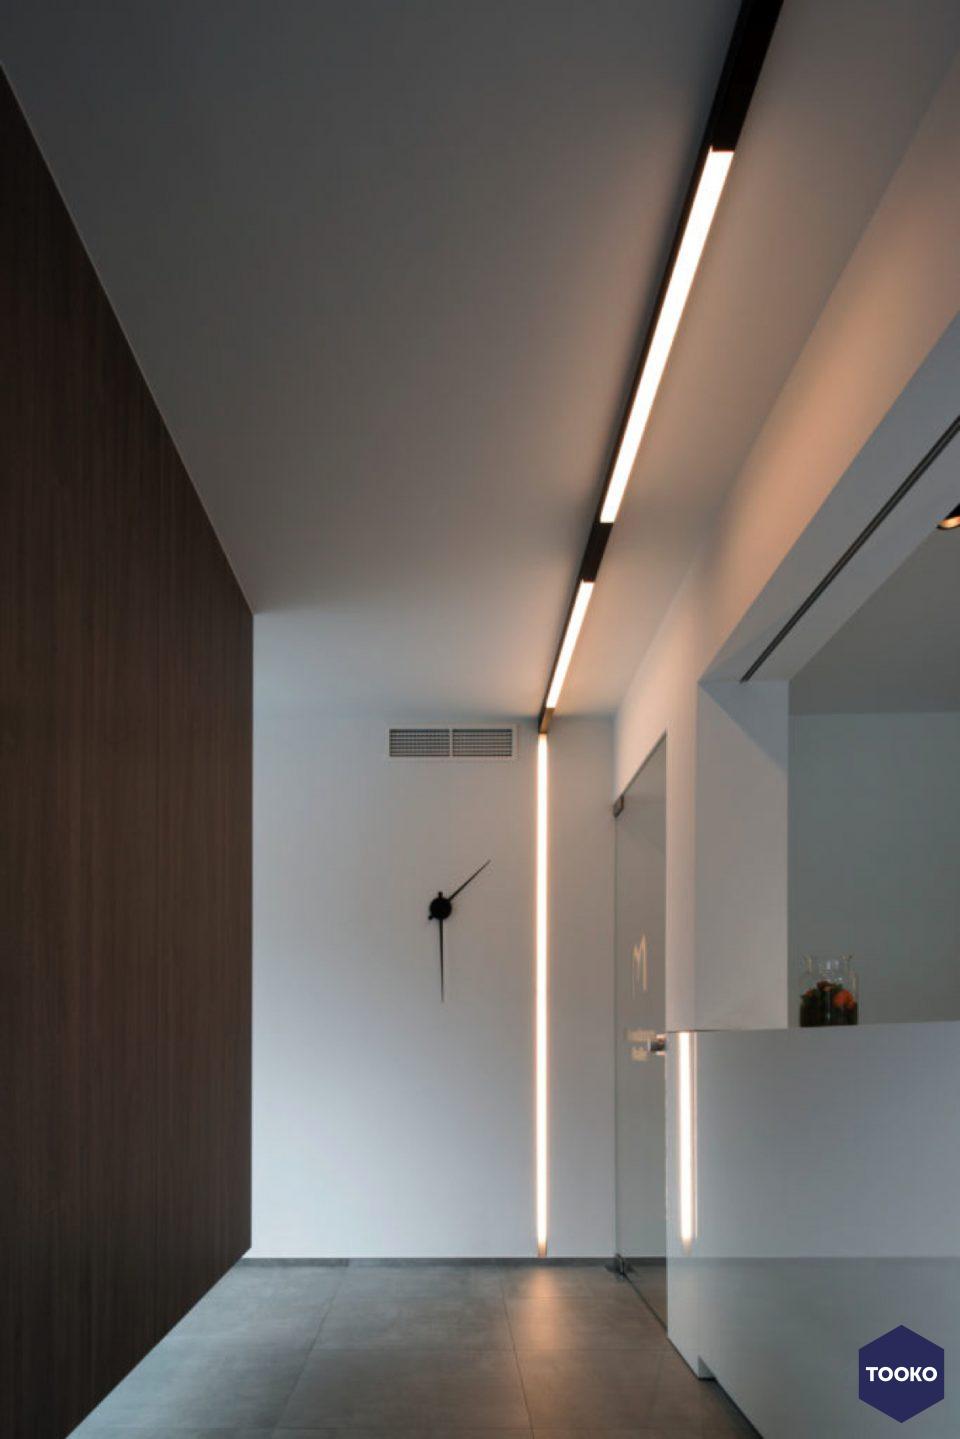 imore interieur architectuur - Mondzorg Malle